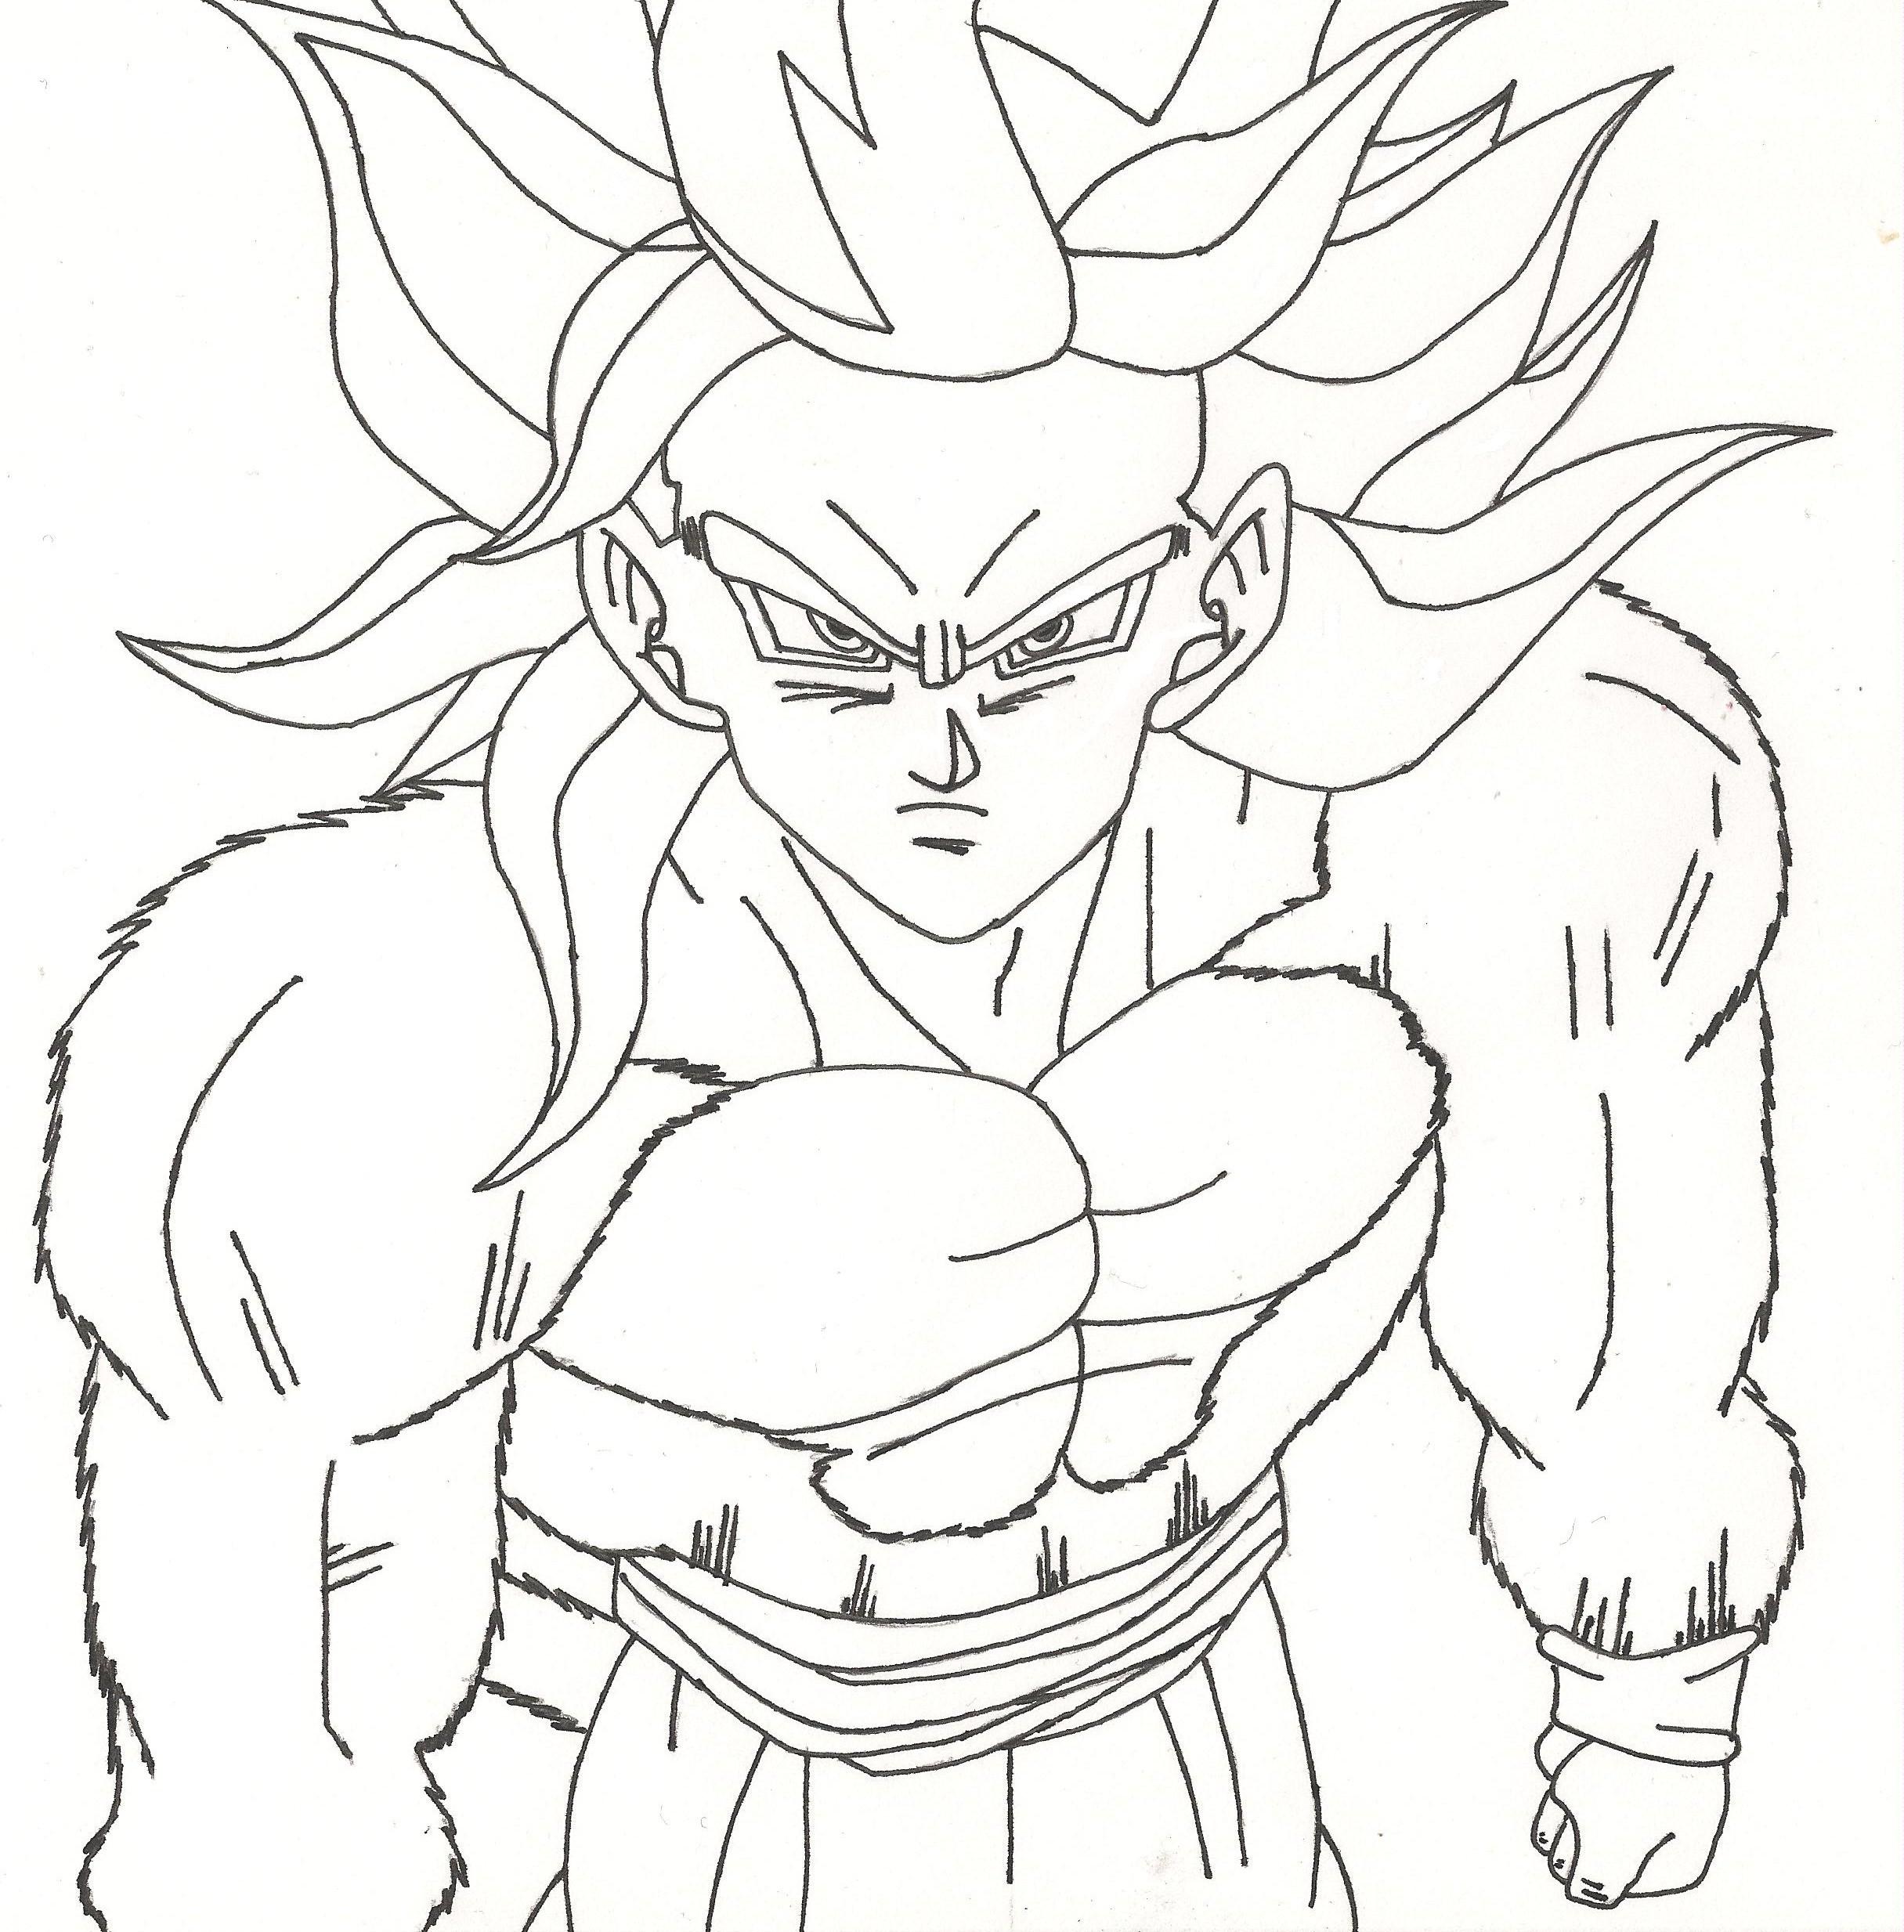 2431x2467 Dragon Ball Z Coloring Pages Goku Super Saiyan 4 Colouring